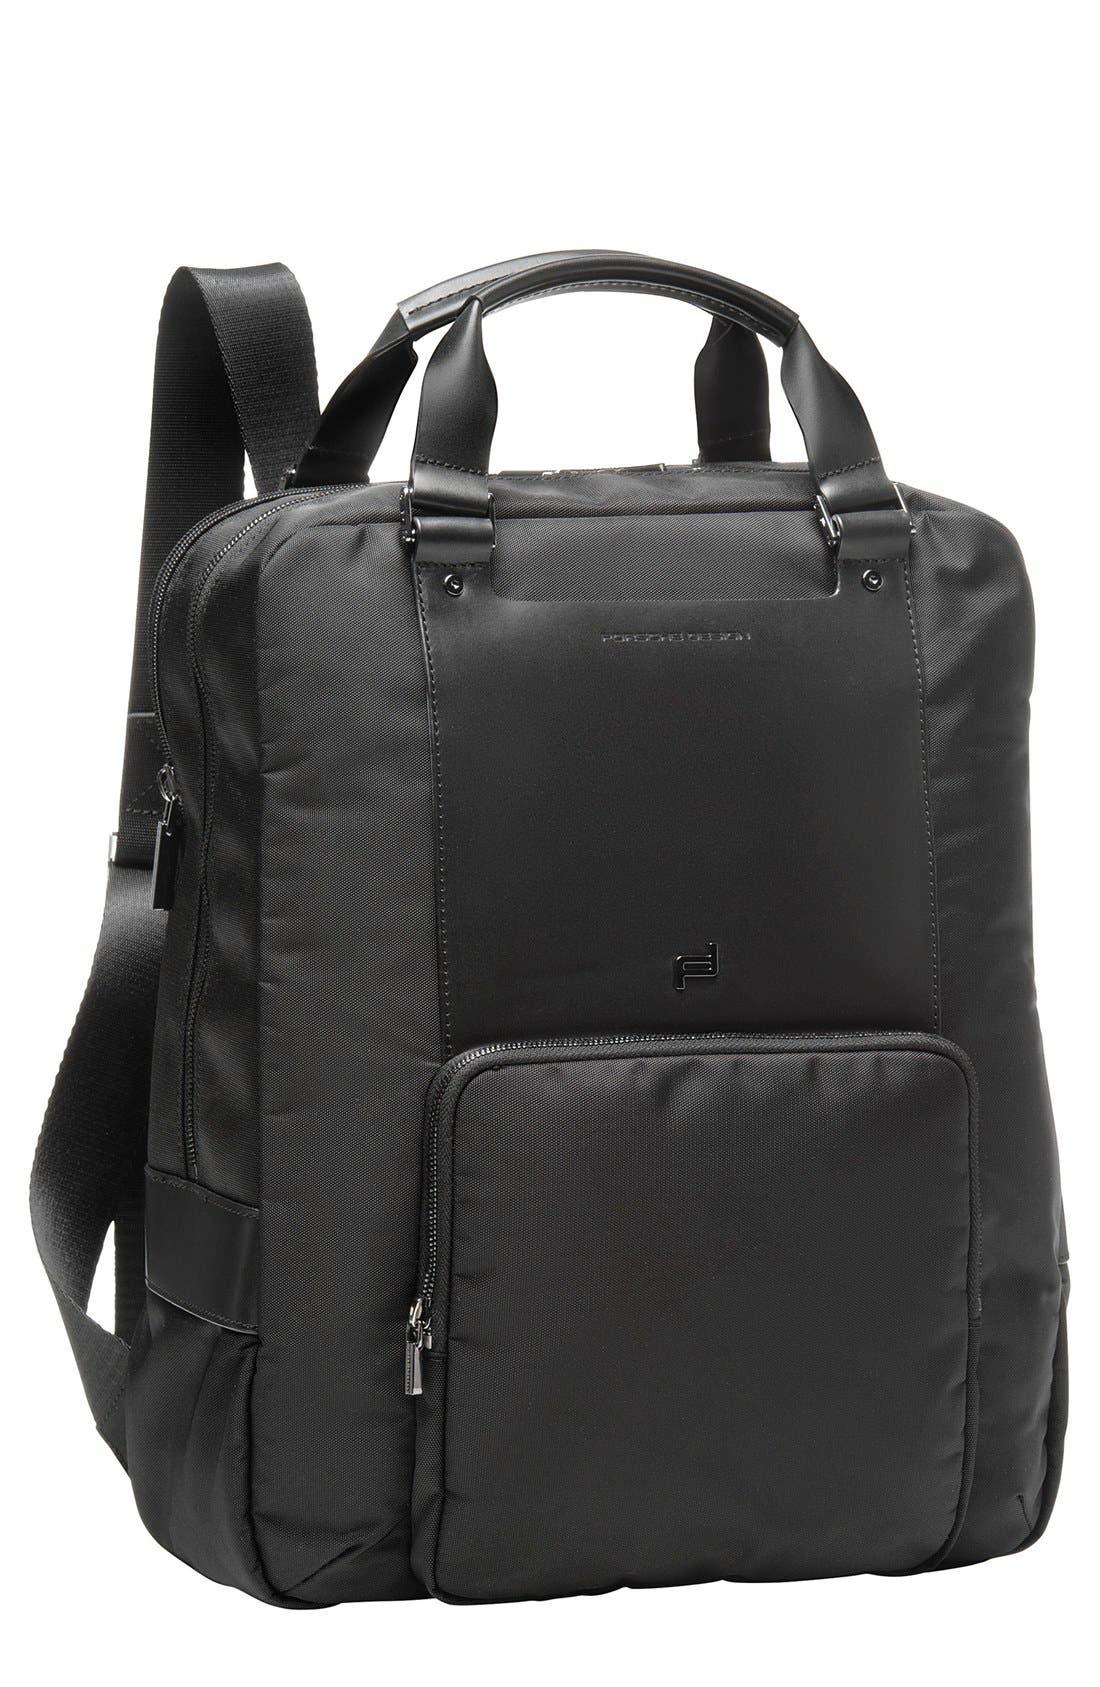 PORSCHE DESIGN 'Shyrt' Backpack